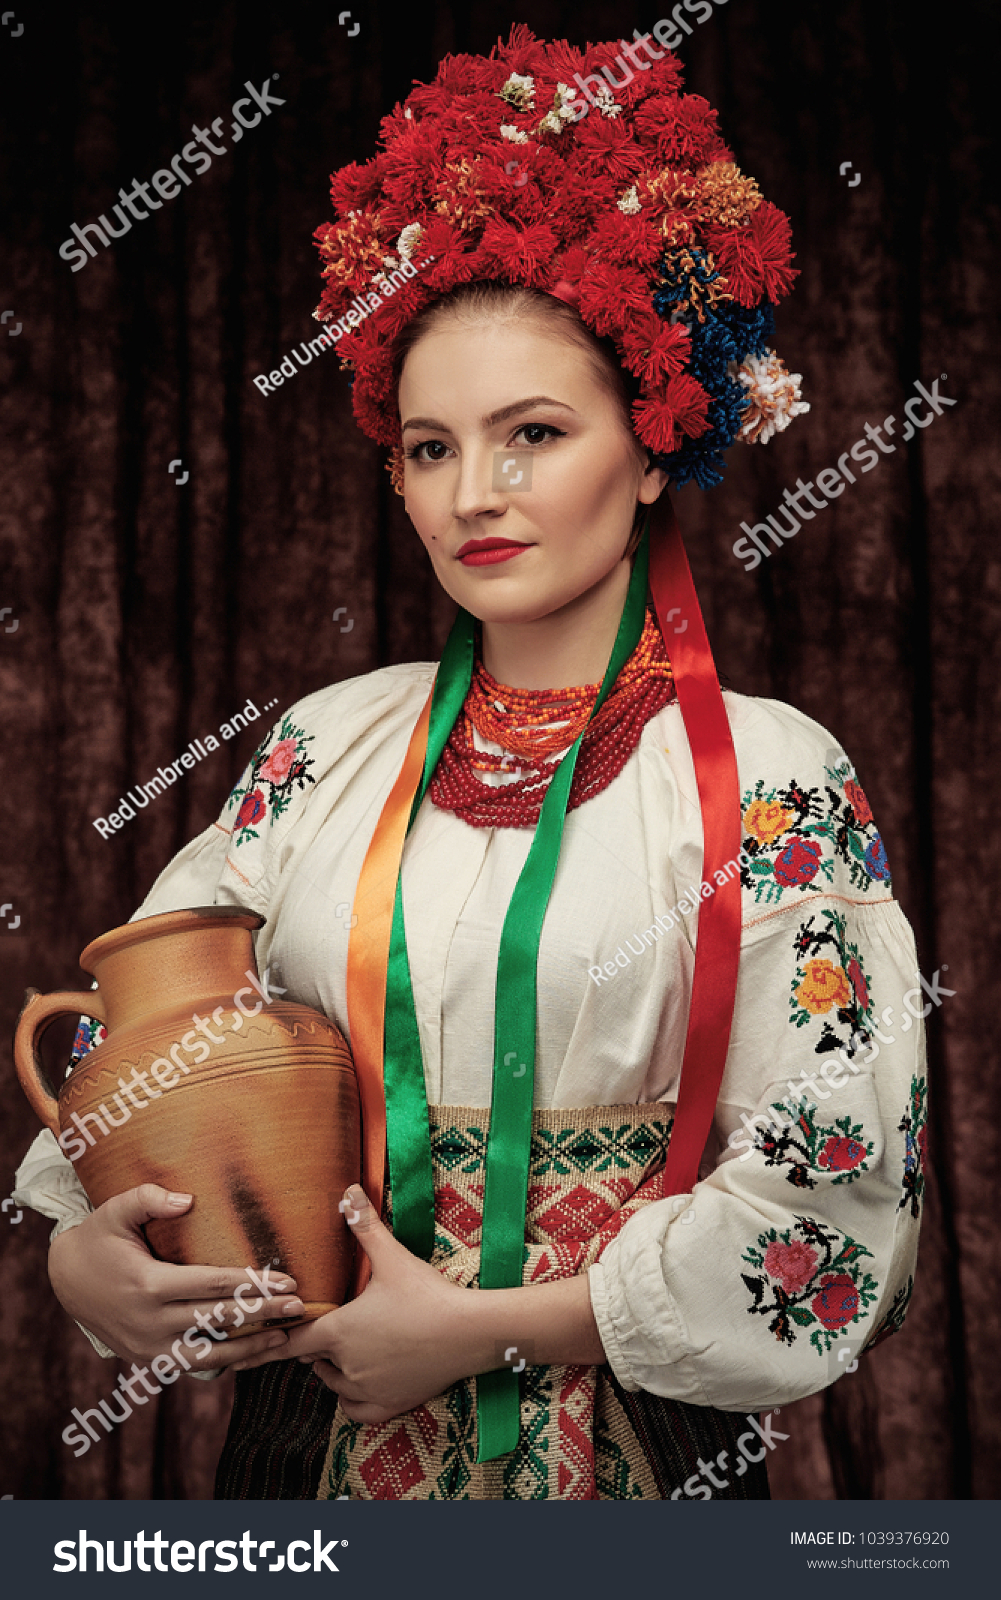 Portrait attractive woman standing traditional slavic stock photo portrait of attractive woman standing in traditional slavic costume wearing embroidered blouse flower crown izmirmasajfo